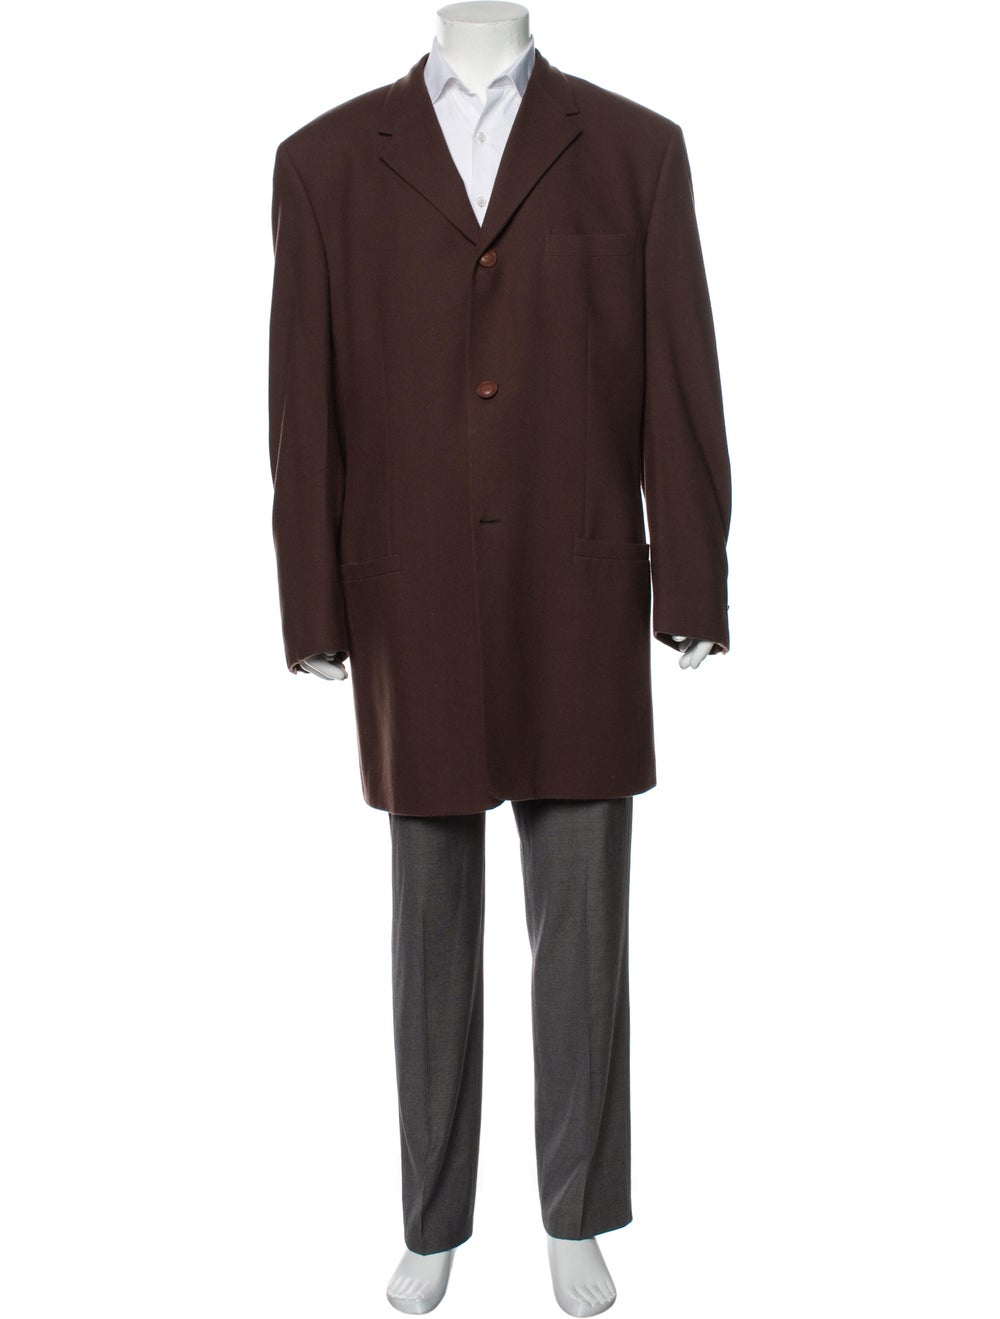 Gianni Versace Vintage Overcoat Brown - image 1